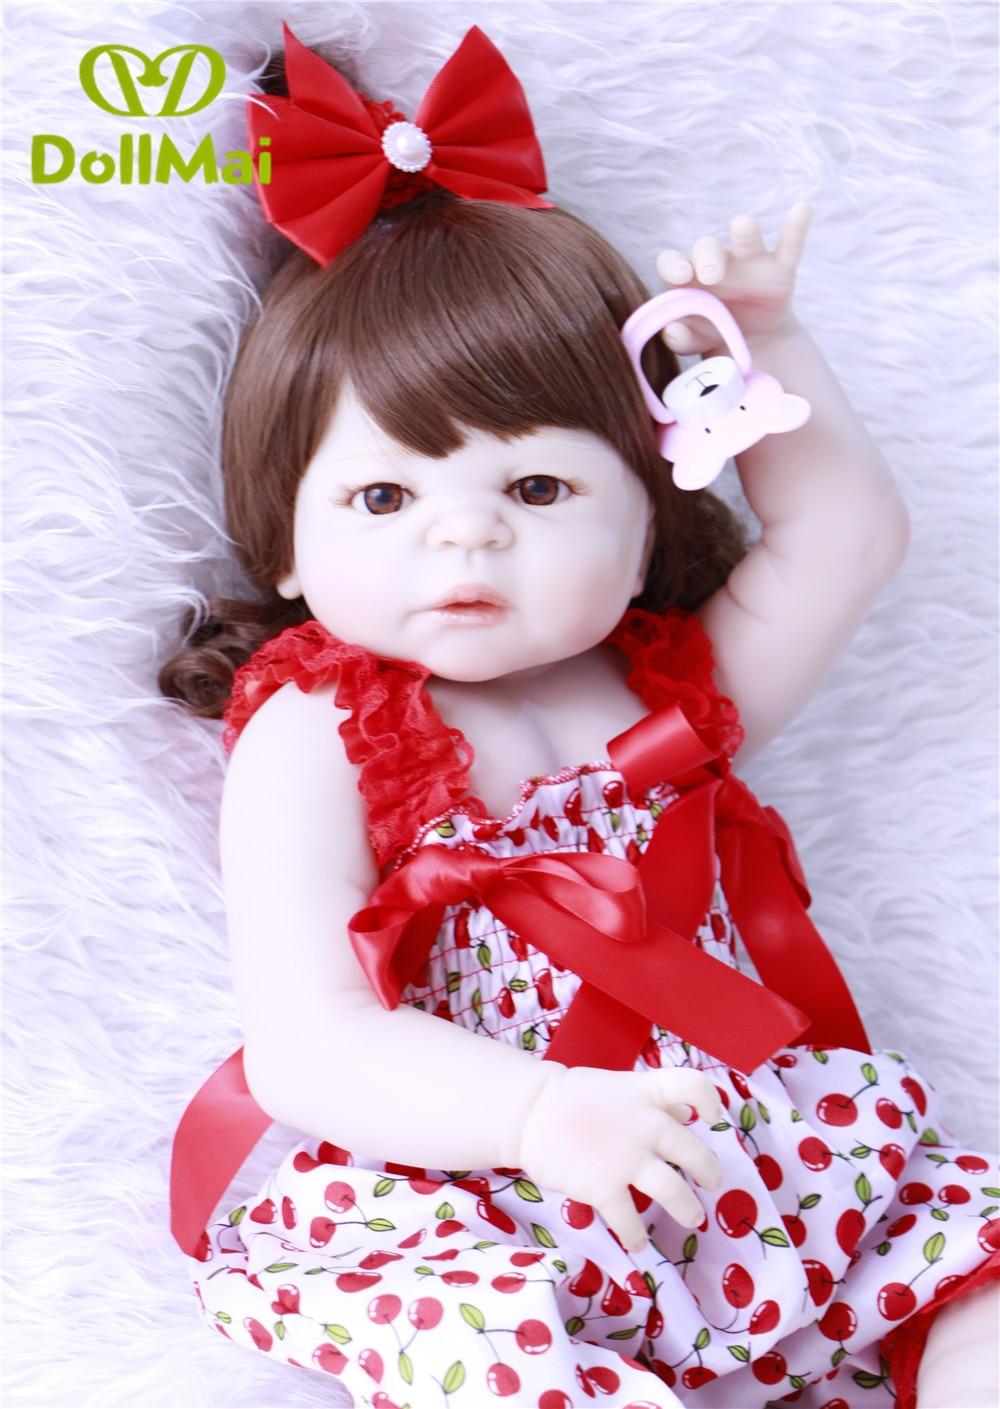 DollMai bebe alive reborn menina boneca 57cm realistic Reborn Baby Doll Girls Full Body Vinyl Silicone